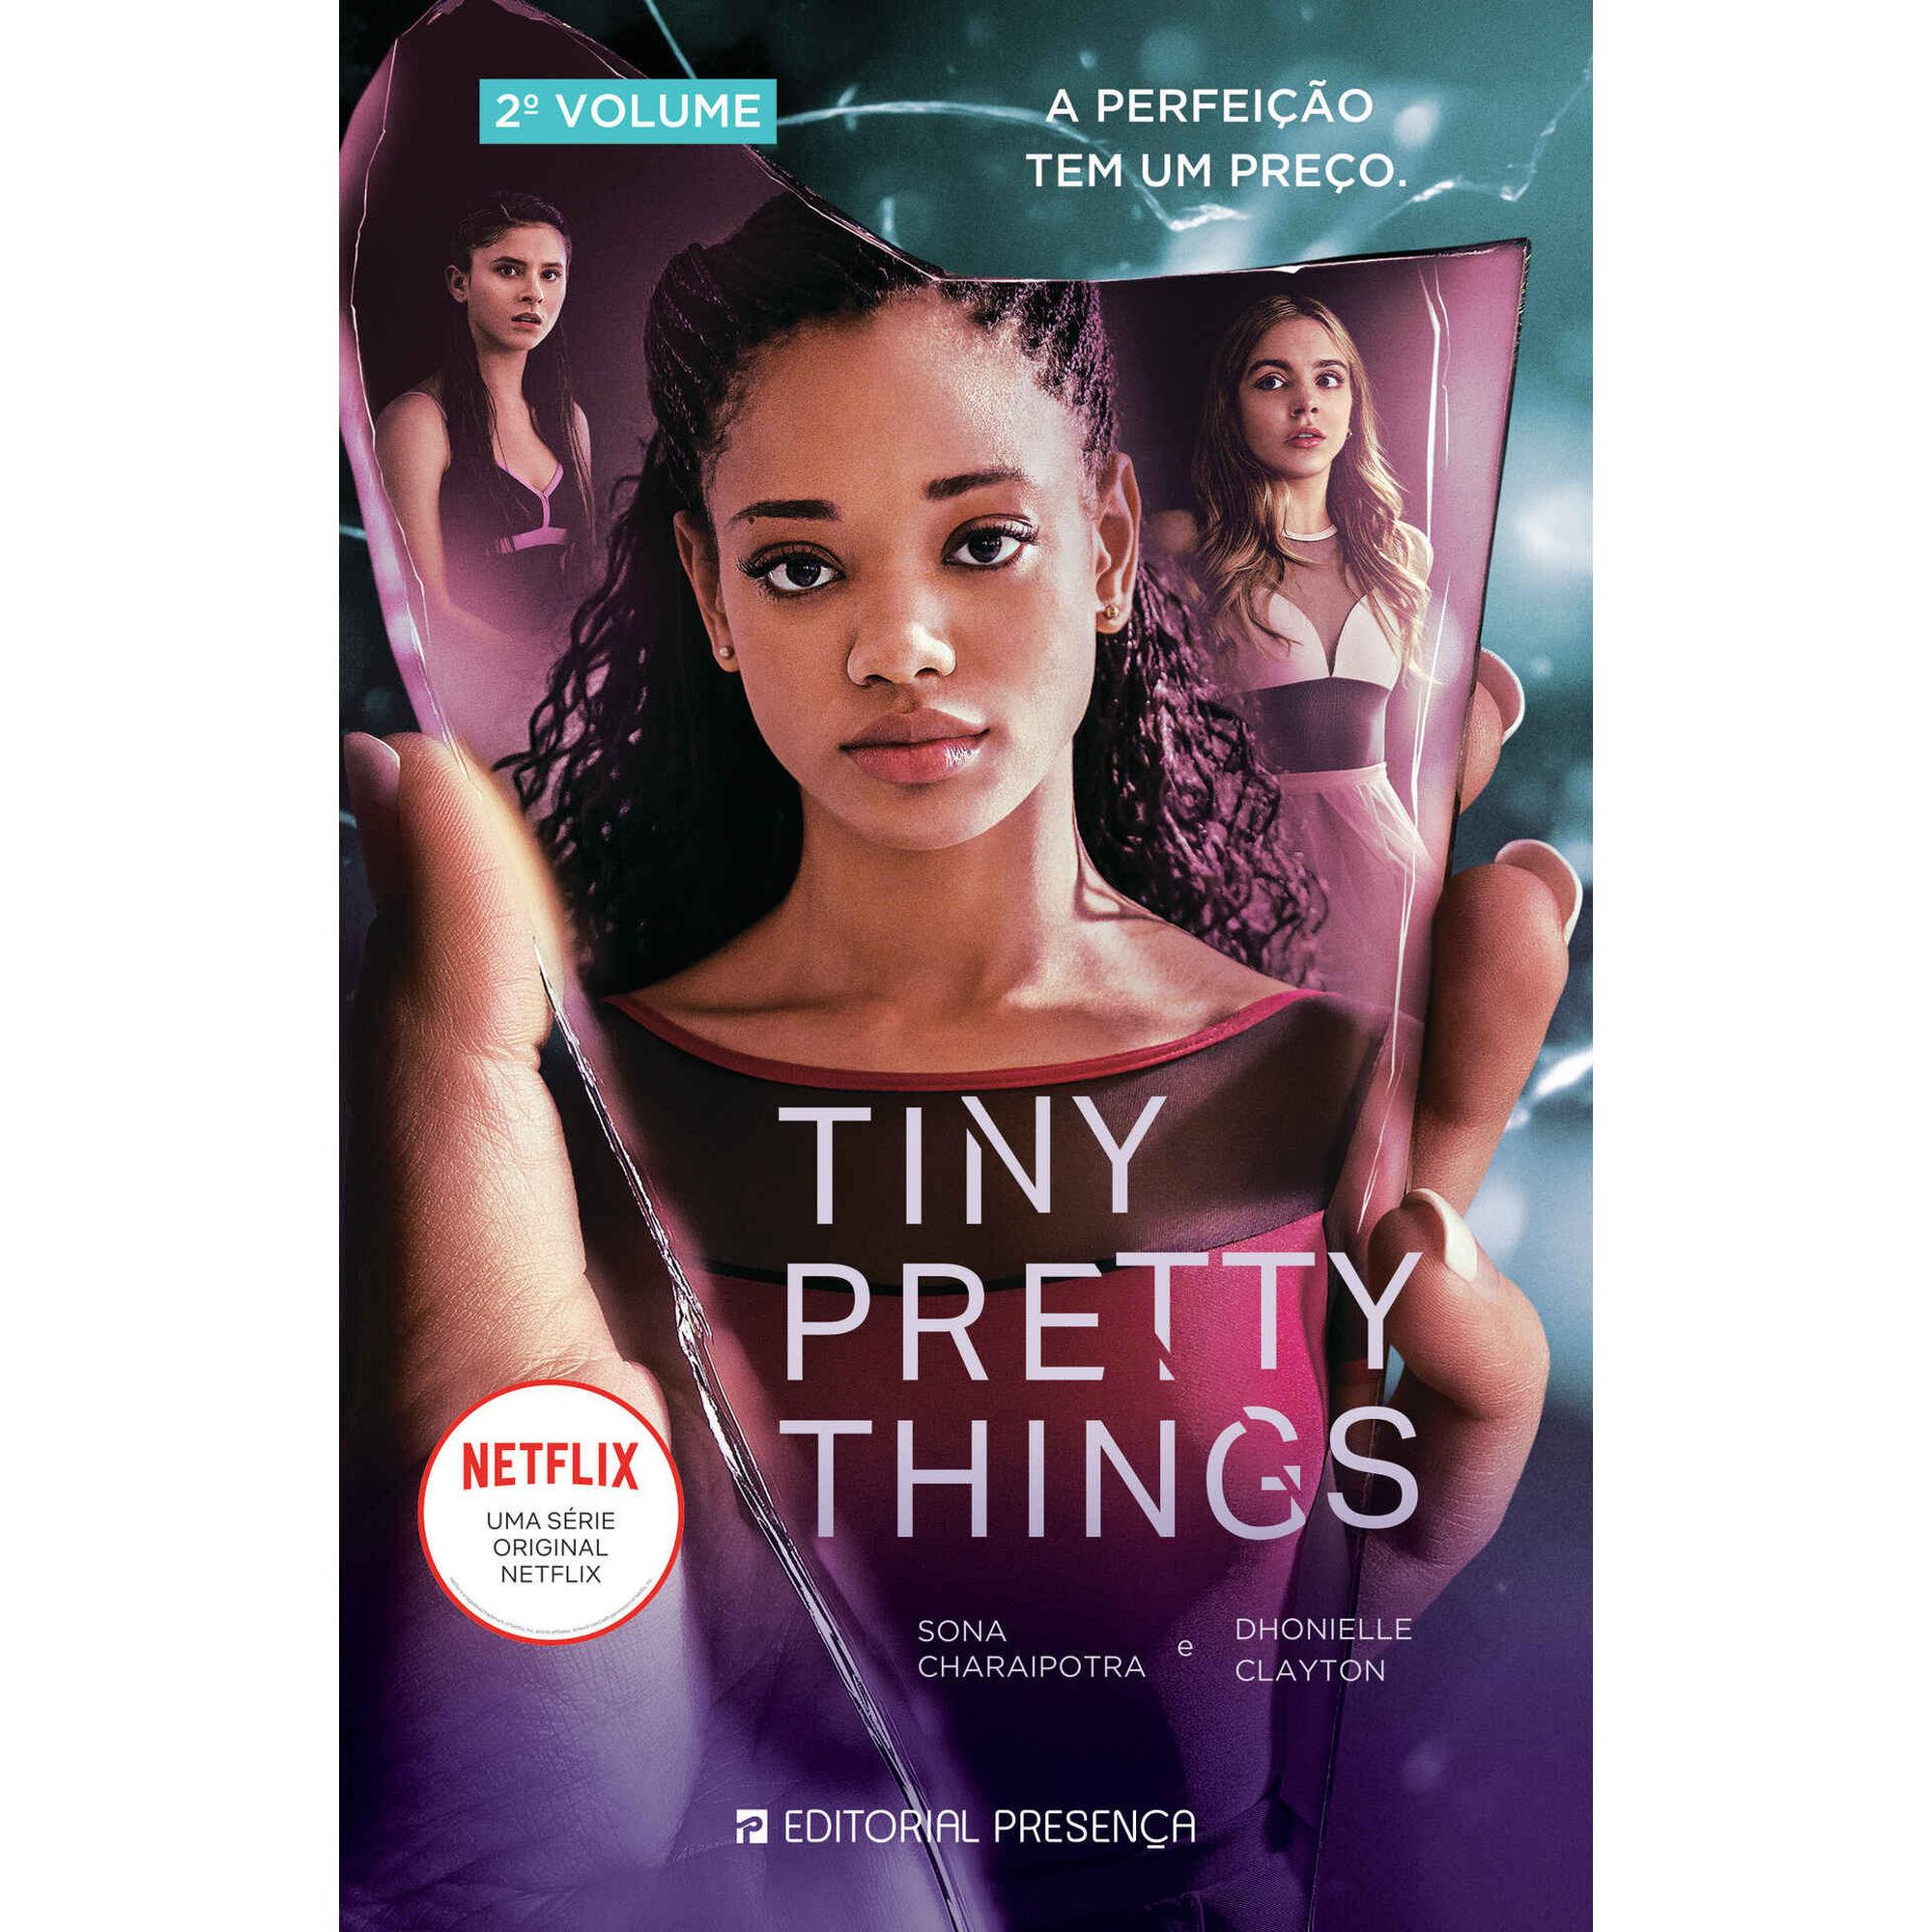 Tiny Pretty Things (volume 2)